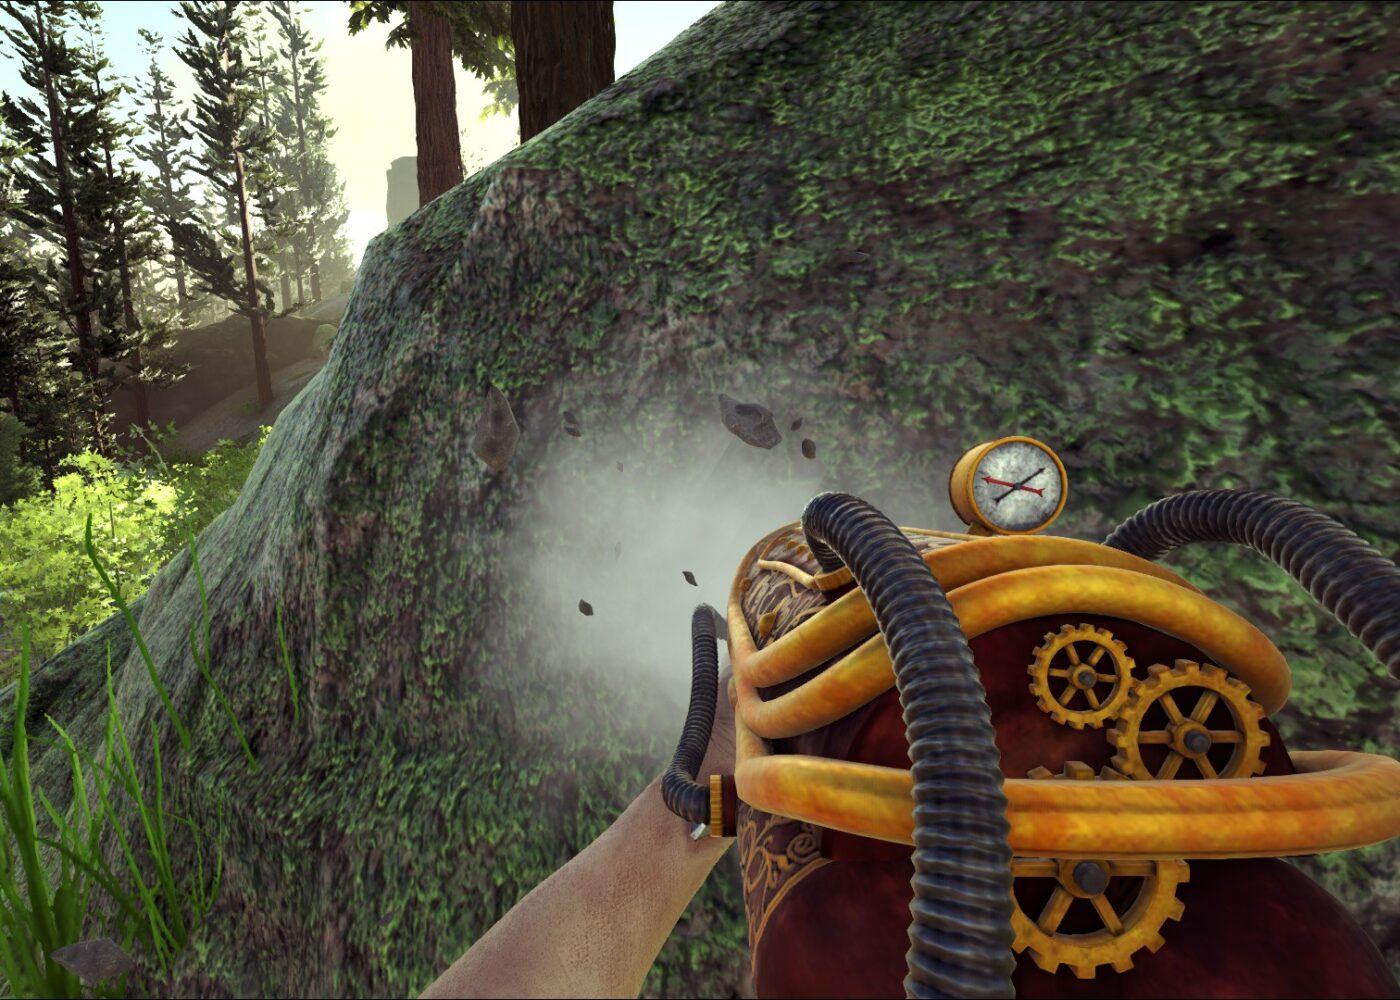 Steampunk Drill